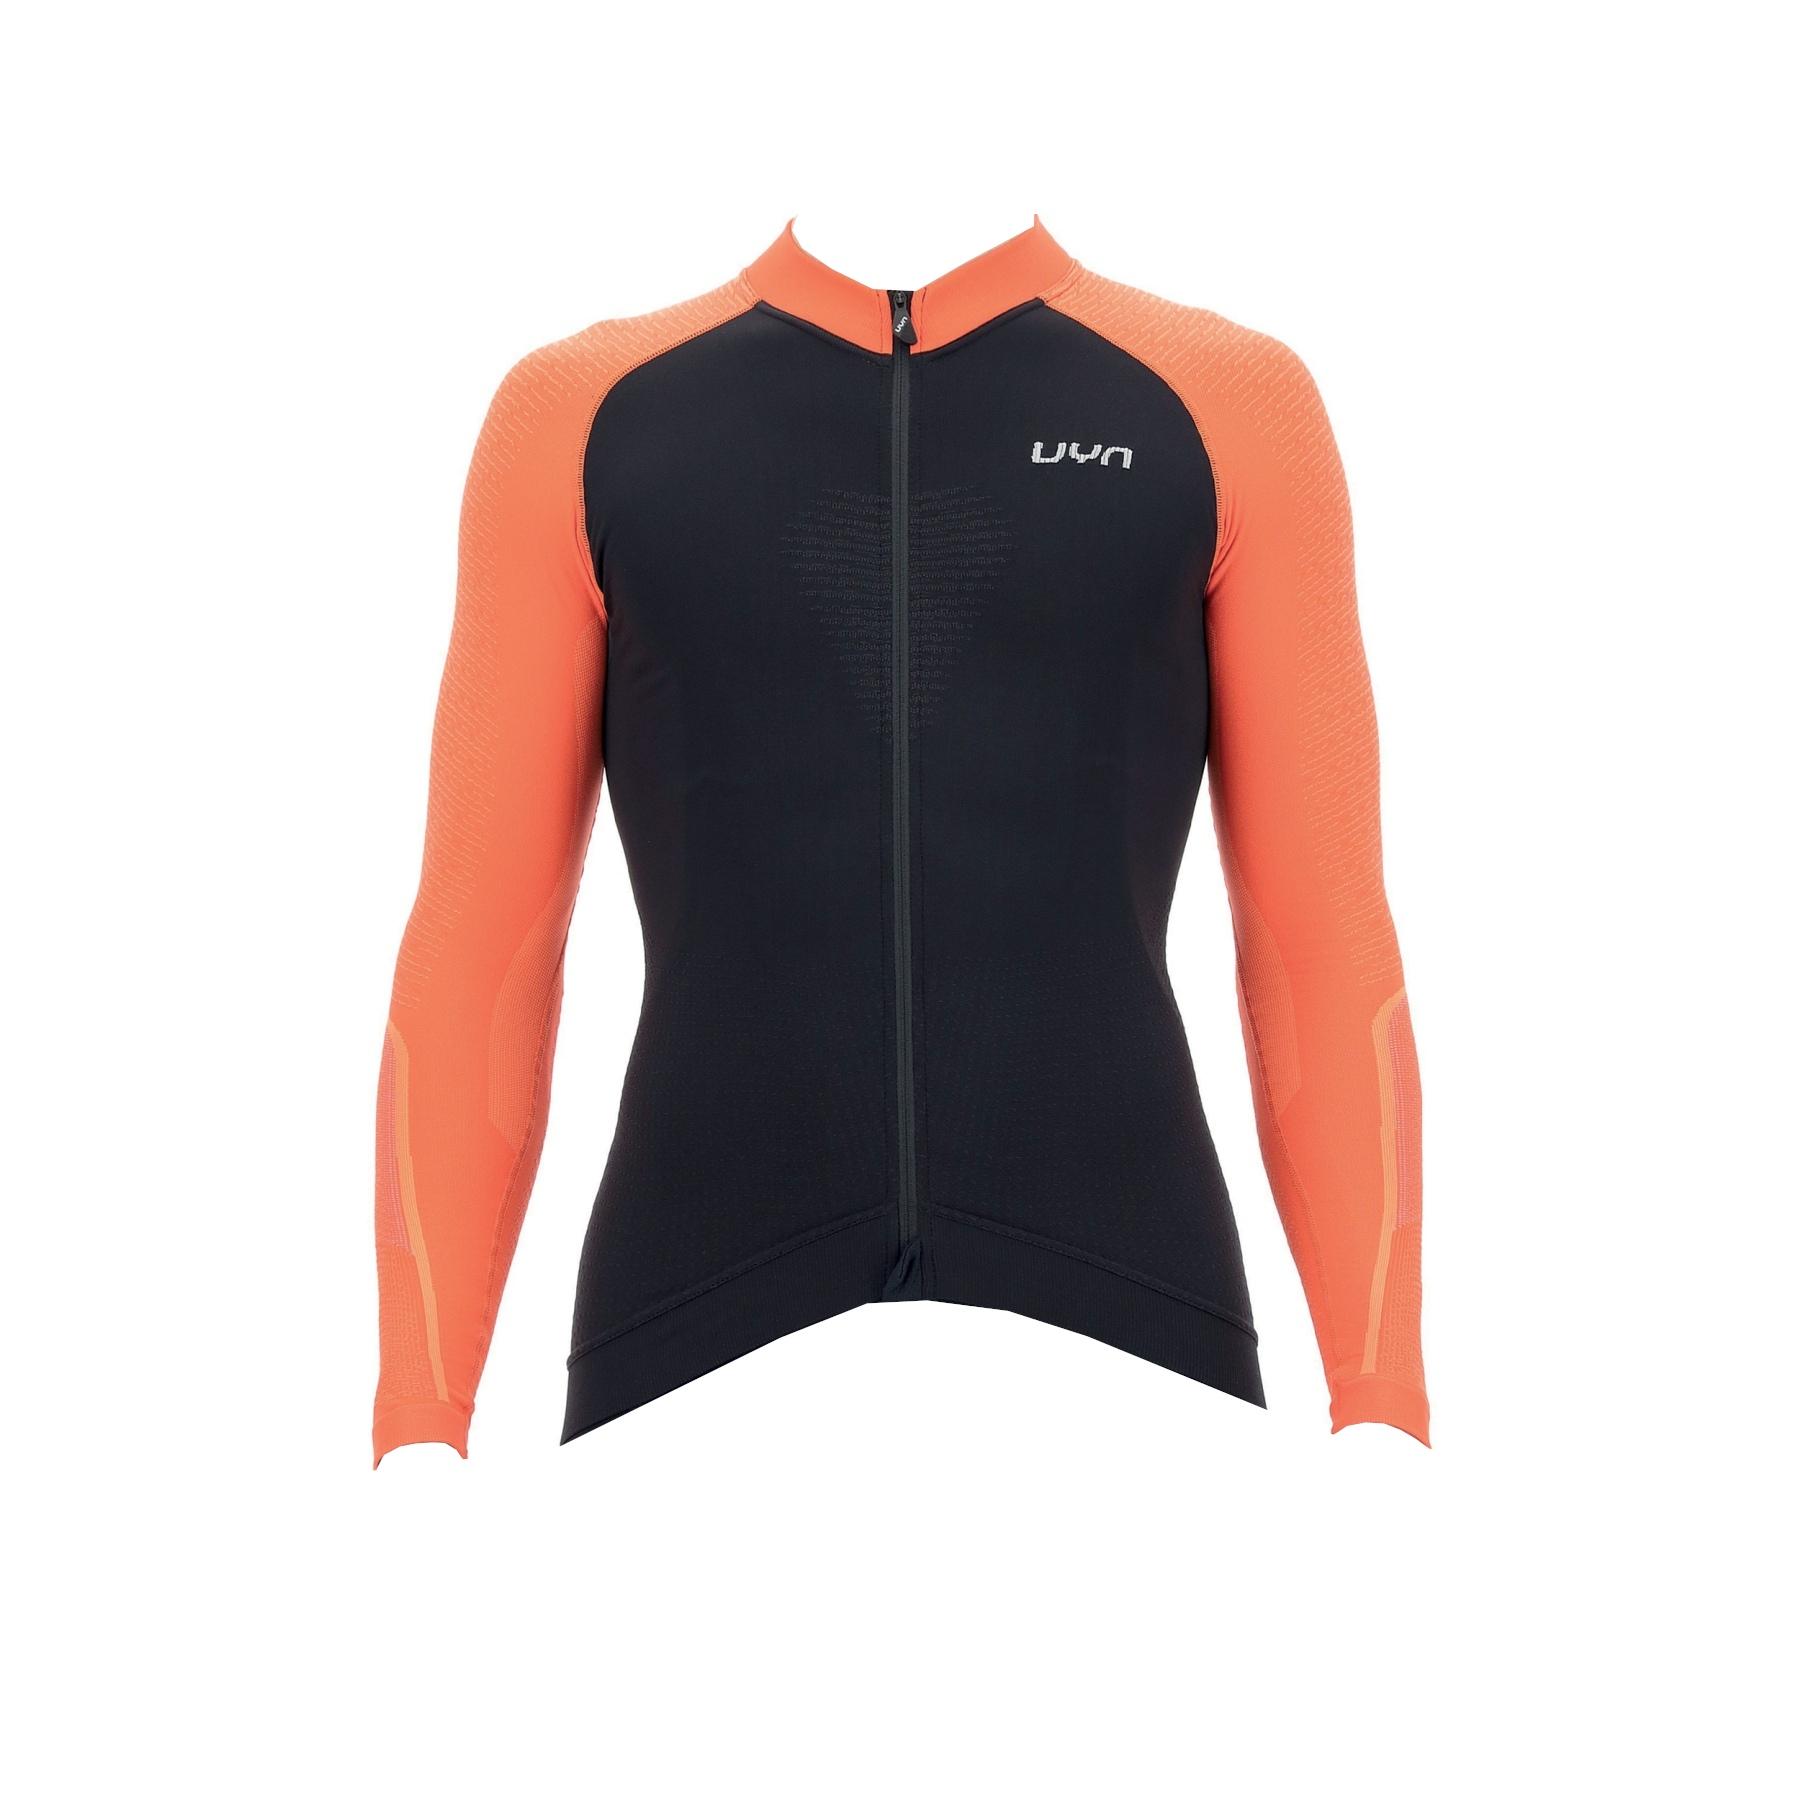 UYN Biking Granfondo Long Sleeve Jersey - Blackboard/Ibis